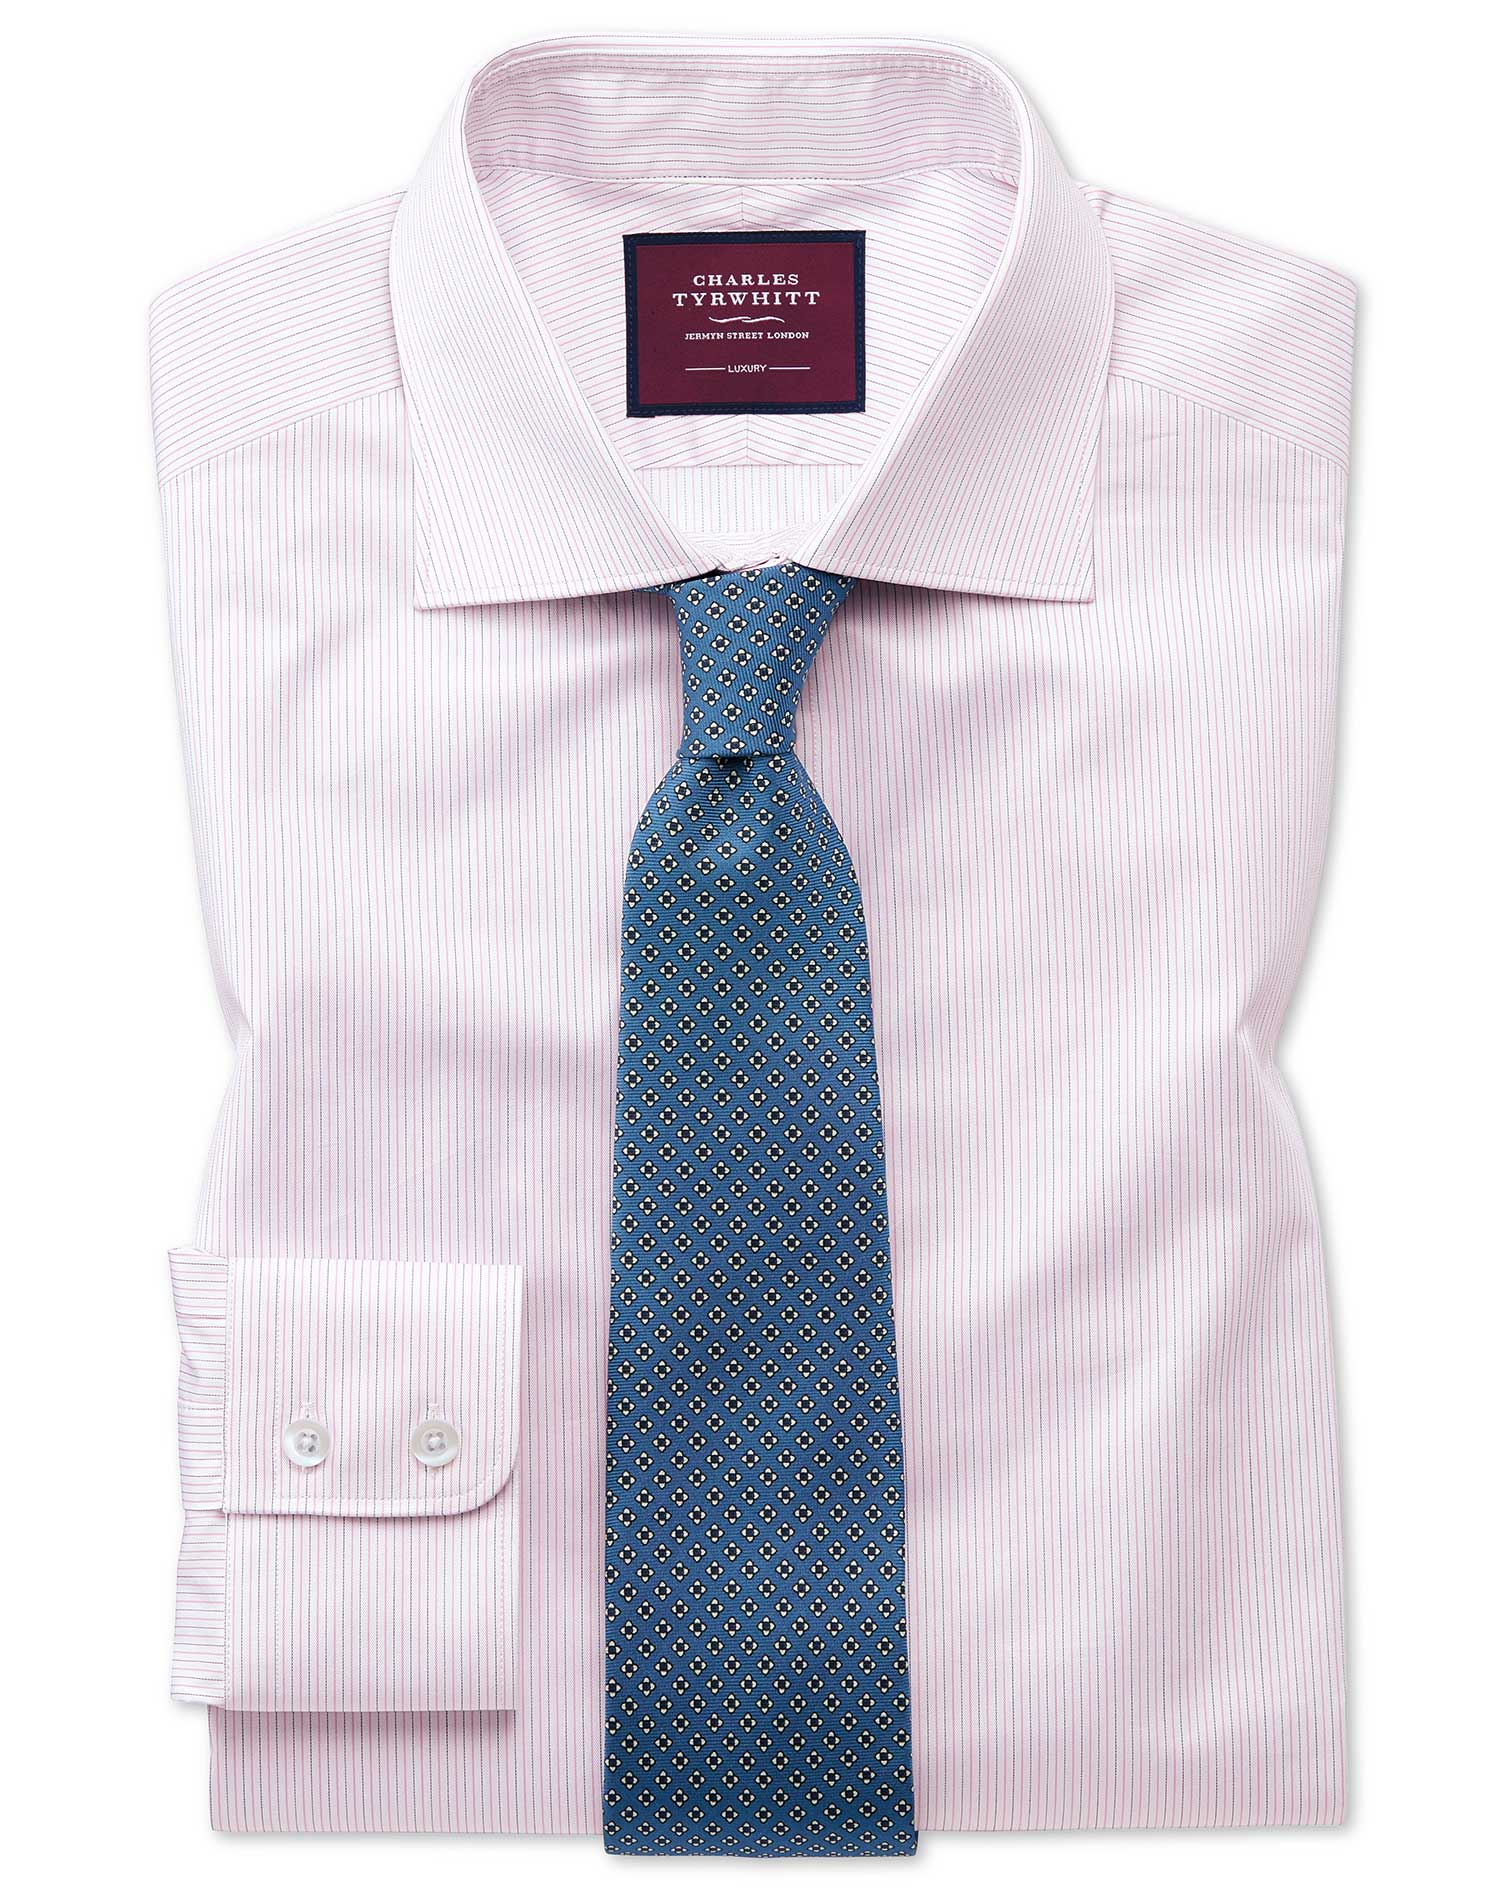 Slim Fit Luxury Fine Stripe Pink Egyptian Cotton Formal Shirt Single Cuff Size 17/37 by Charles Tyrw